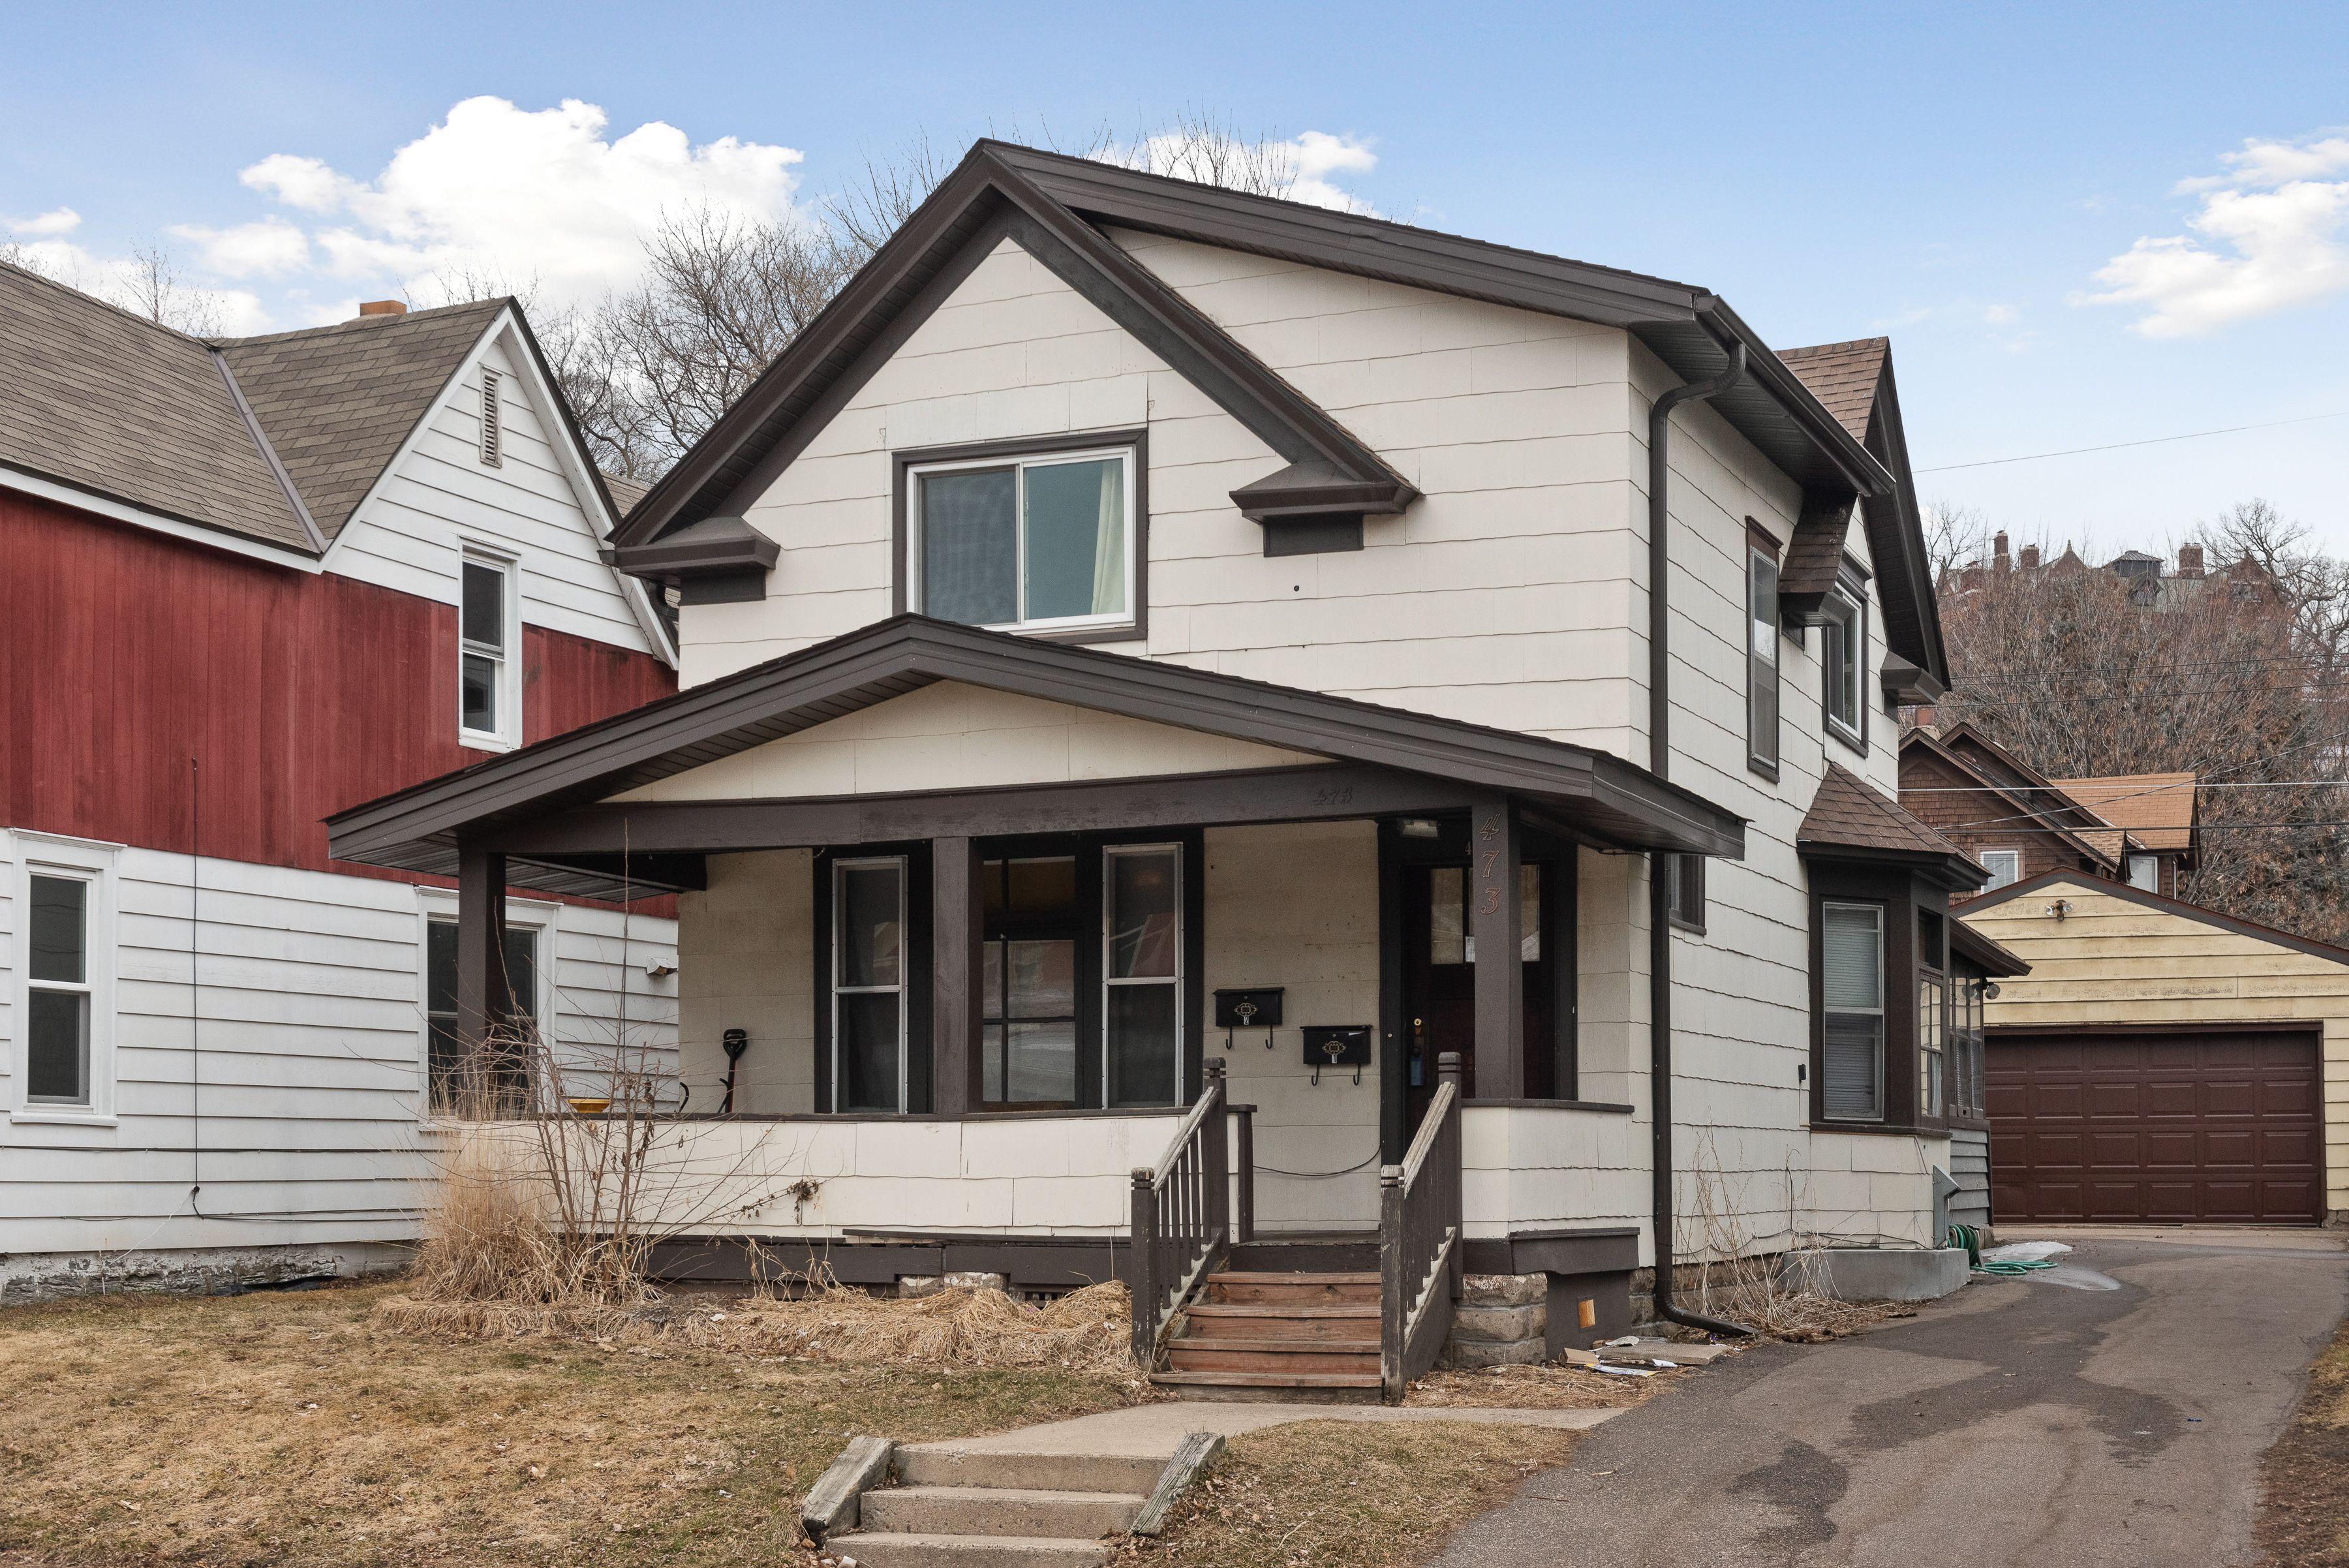 473 Banfil St, Saint Paul, MN